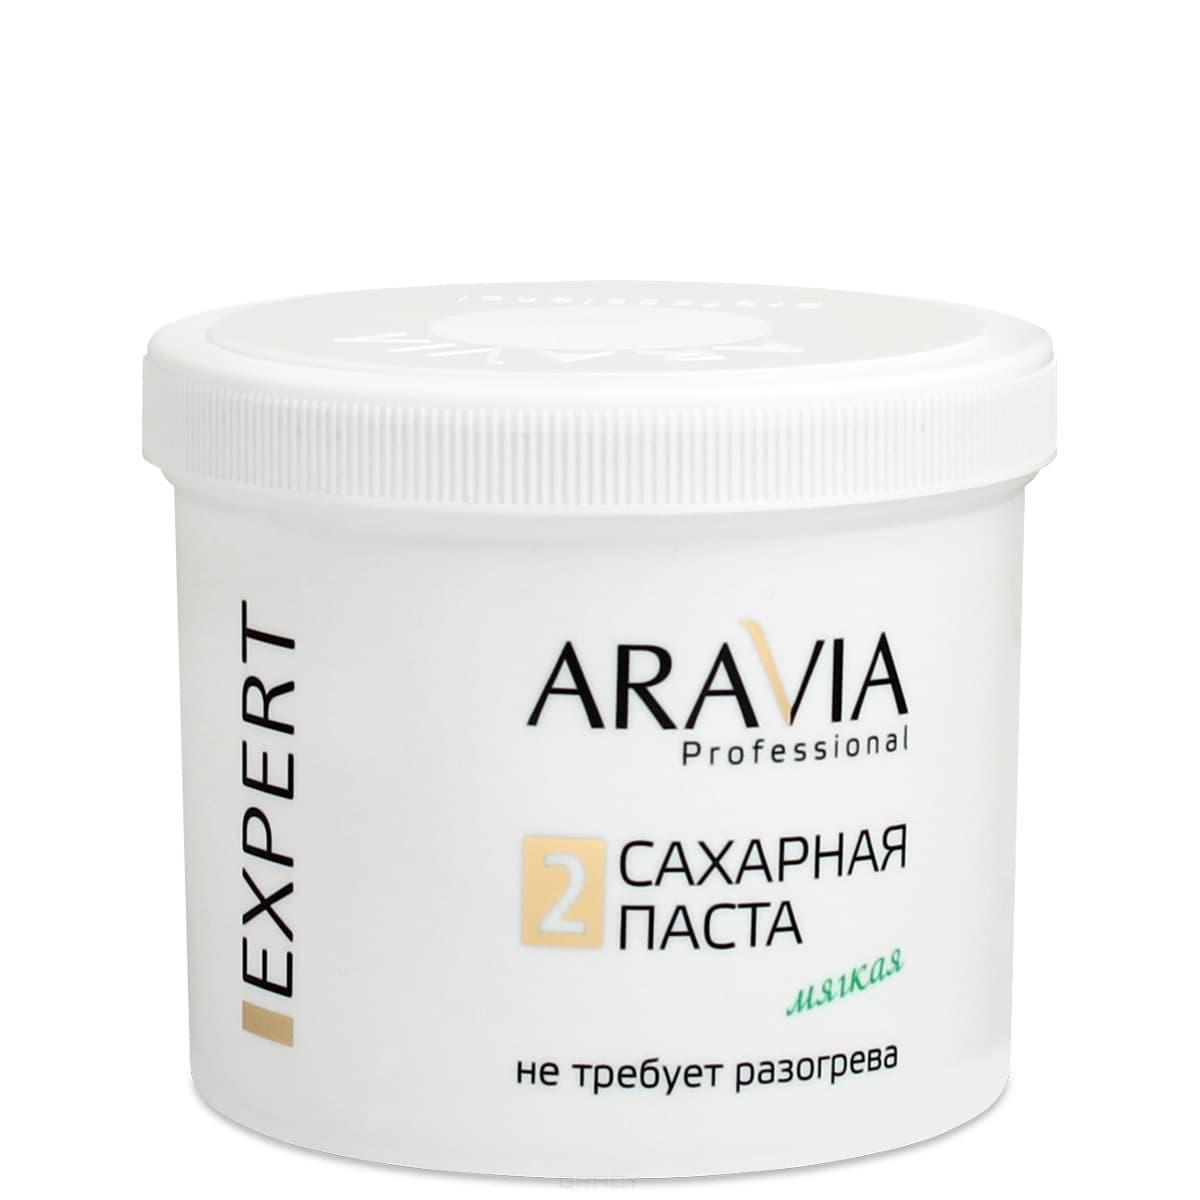 Aravia, Сахарна паста дл депилции EXPERT 2 Мгка, 750 грПаста дл шугаринга<br><br>